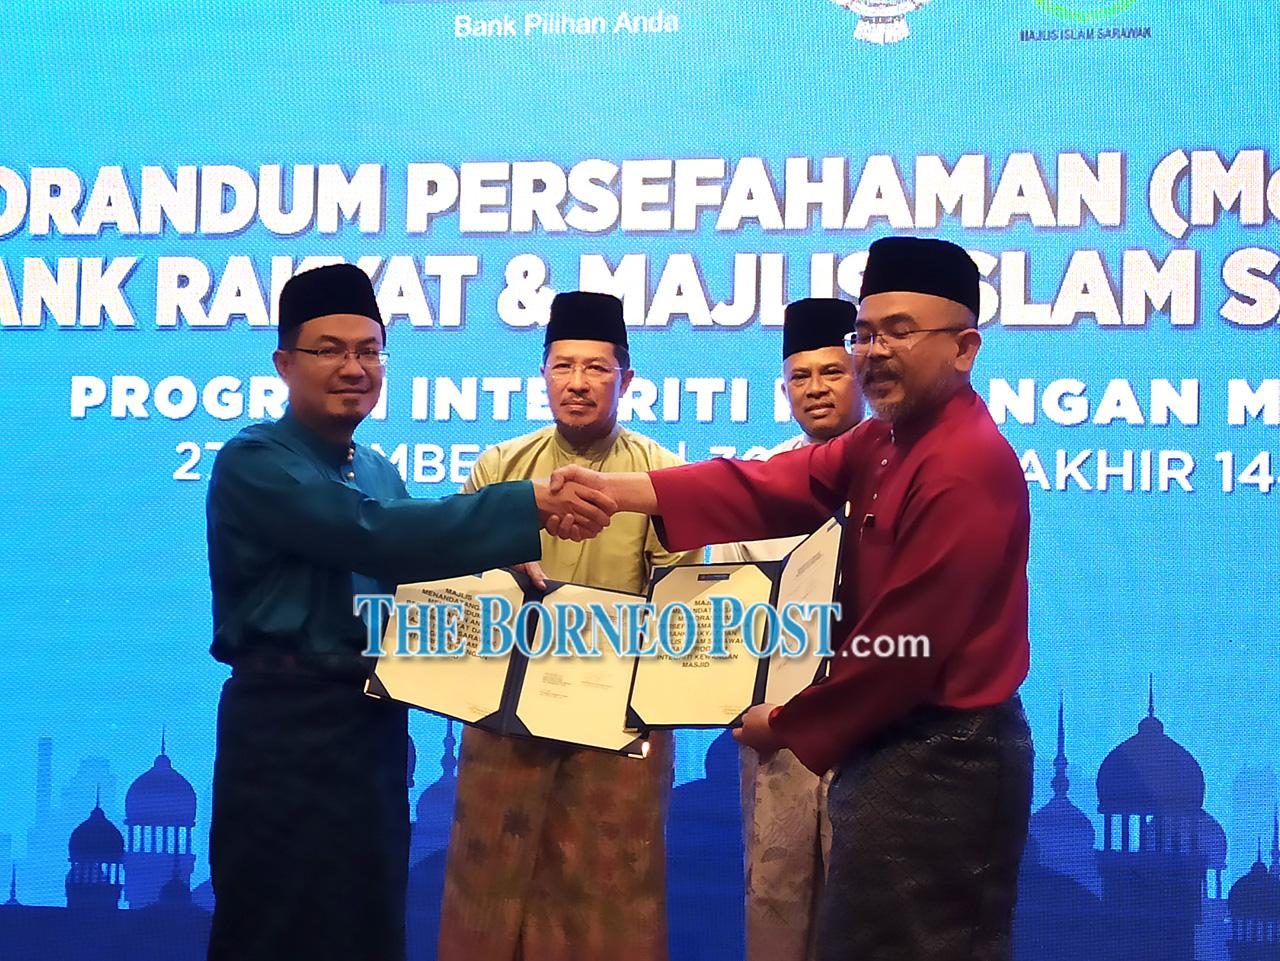 Bank Rakyat, MIS to implement PINK Masjid initiative